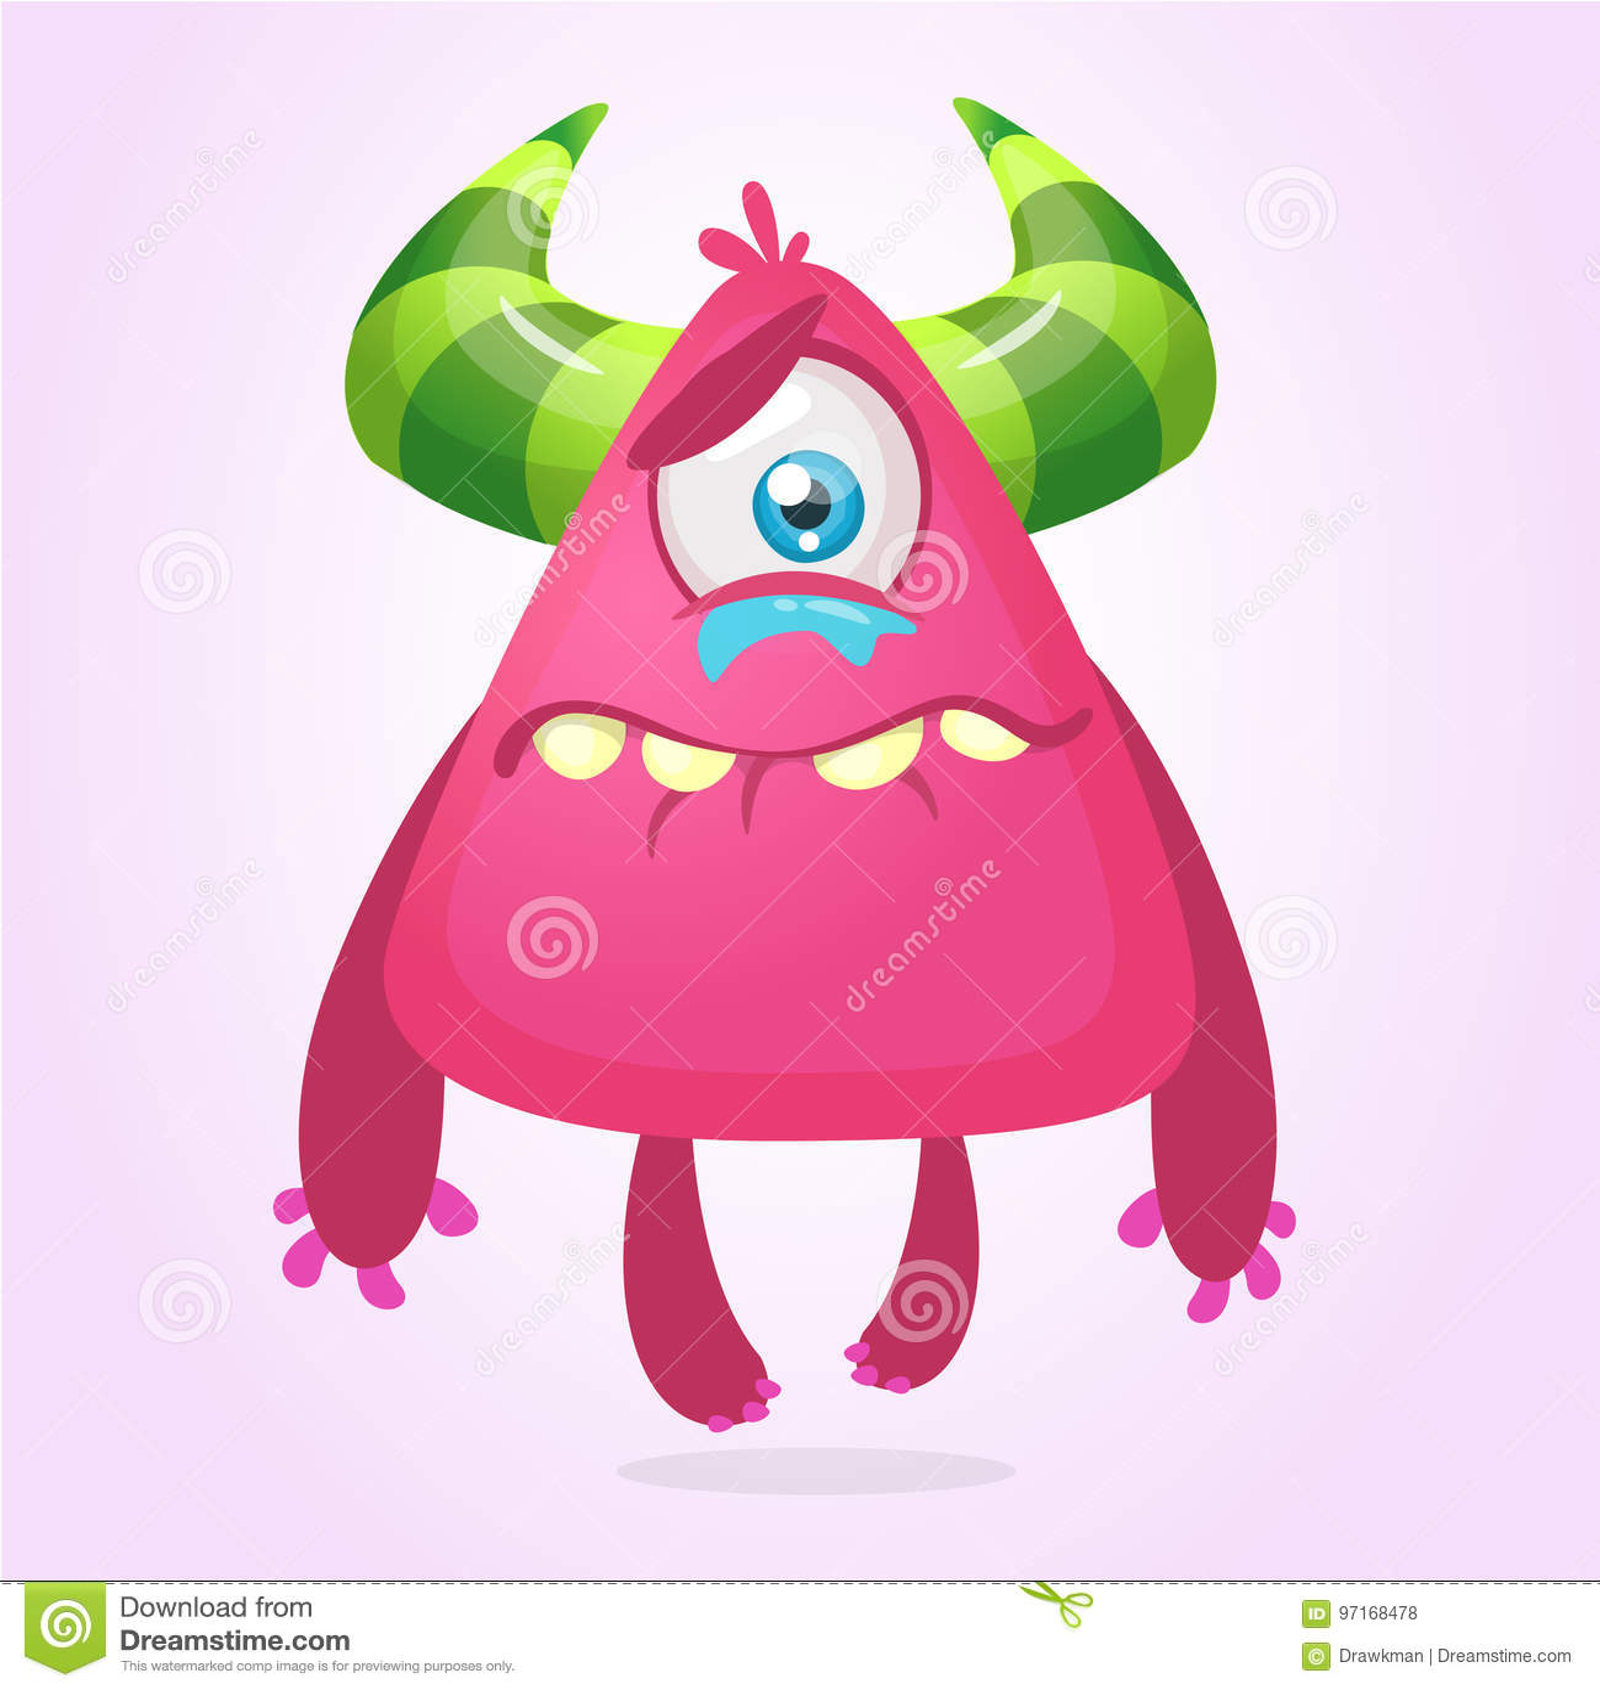 Crying upset monster cartoon. Pink monster character mascot. Vector illustration for Halloween.